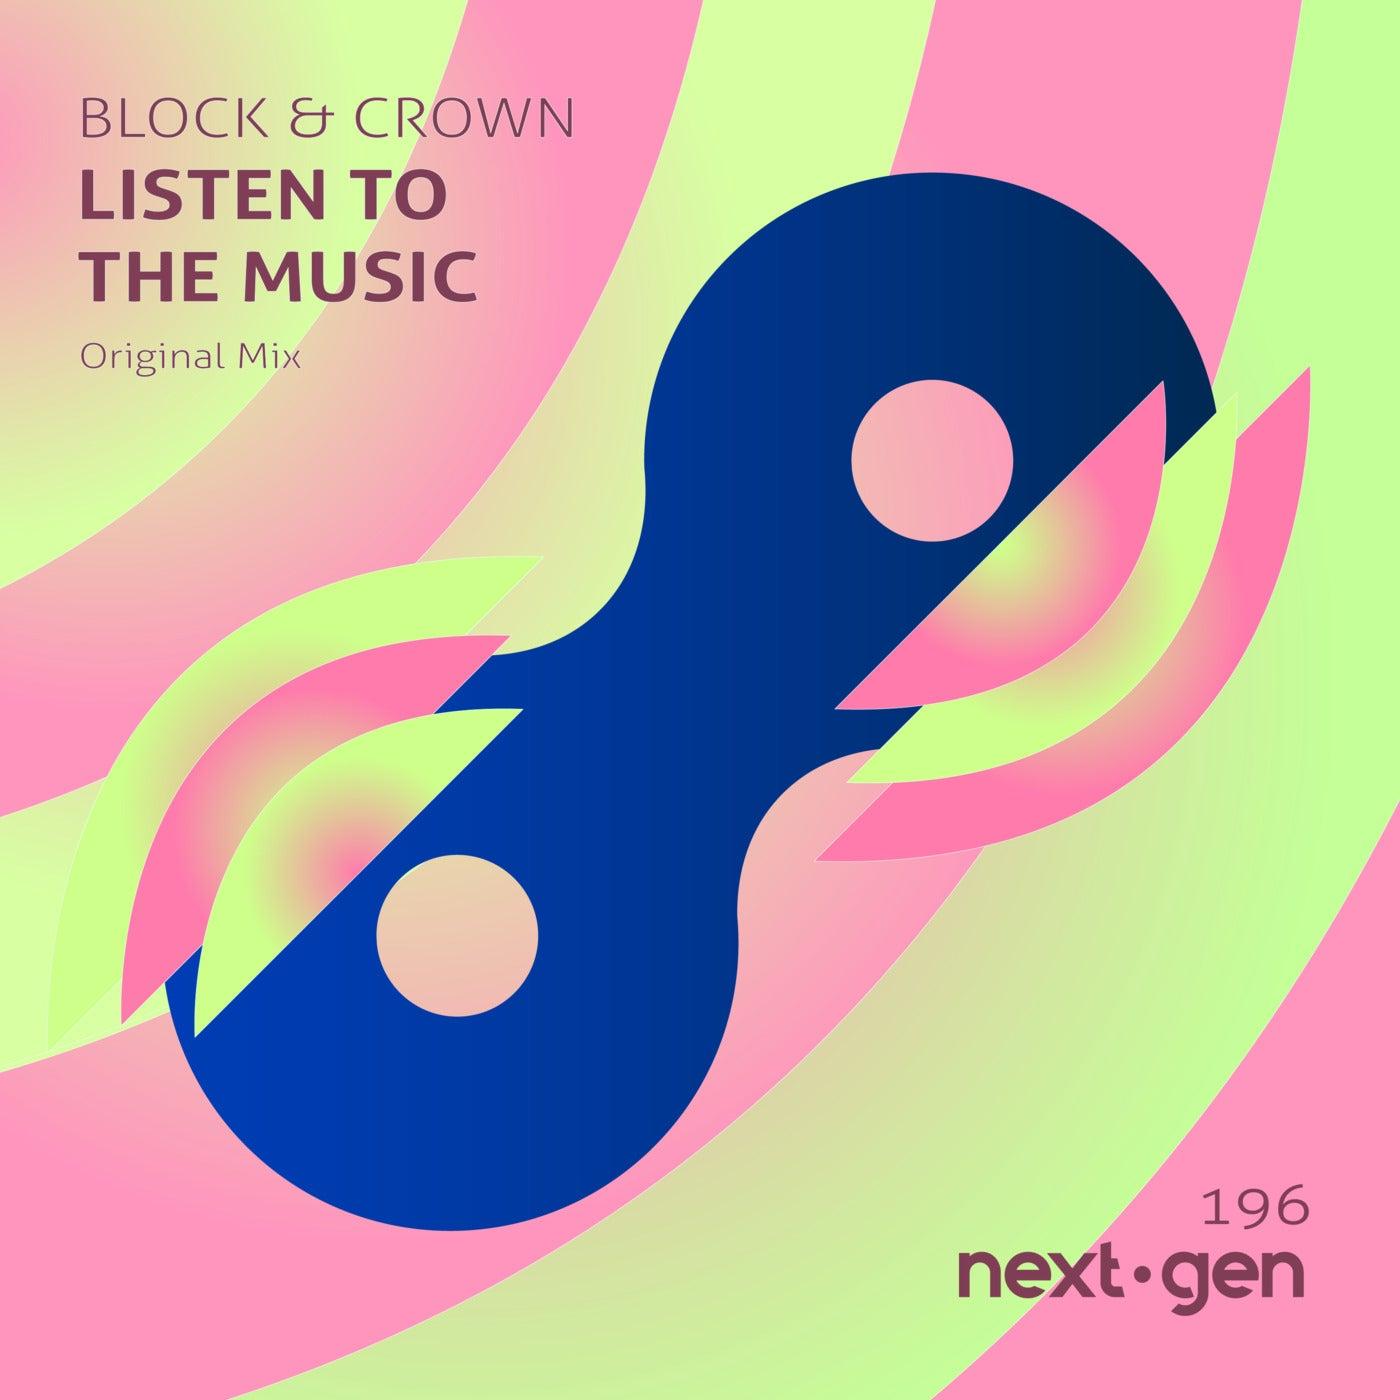 Listen To The Music (Original Mix)